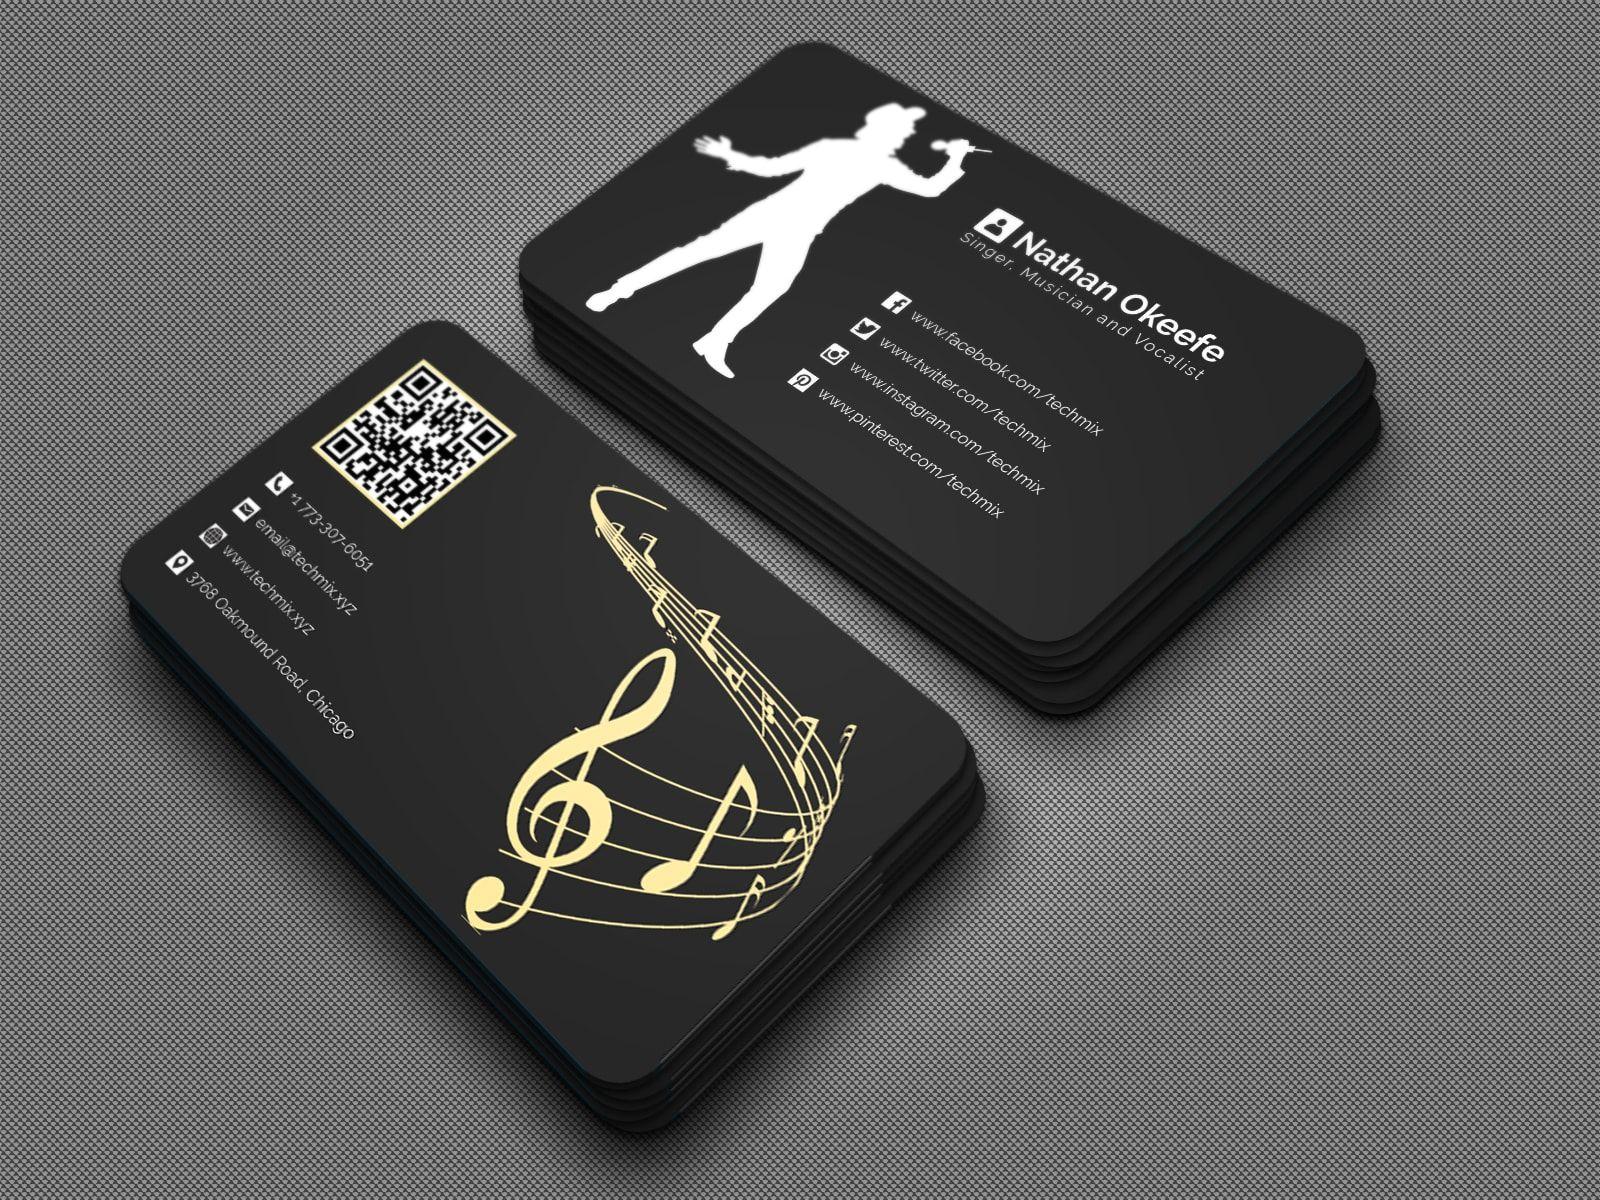 Singer Musician Vocalist Business Card Design Musician Business Card Business Card Design Business Cards Collection